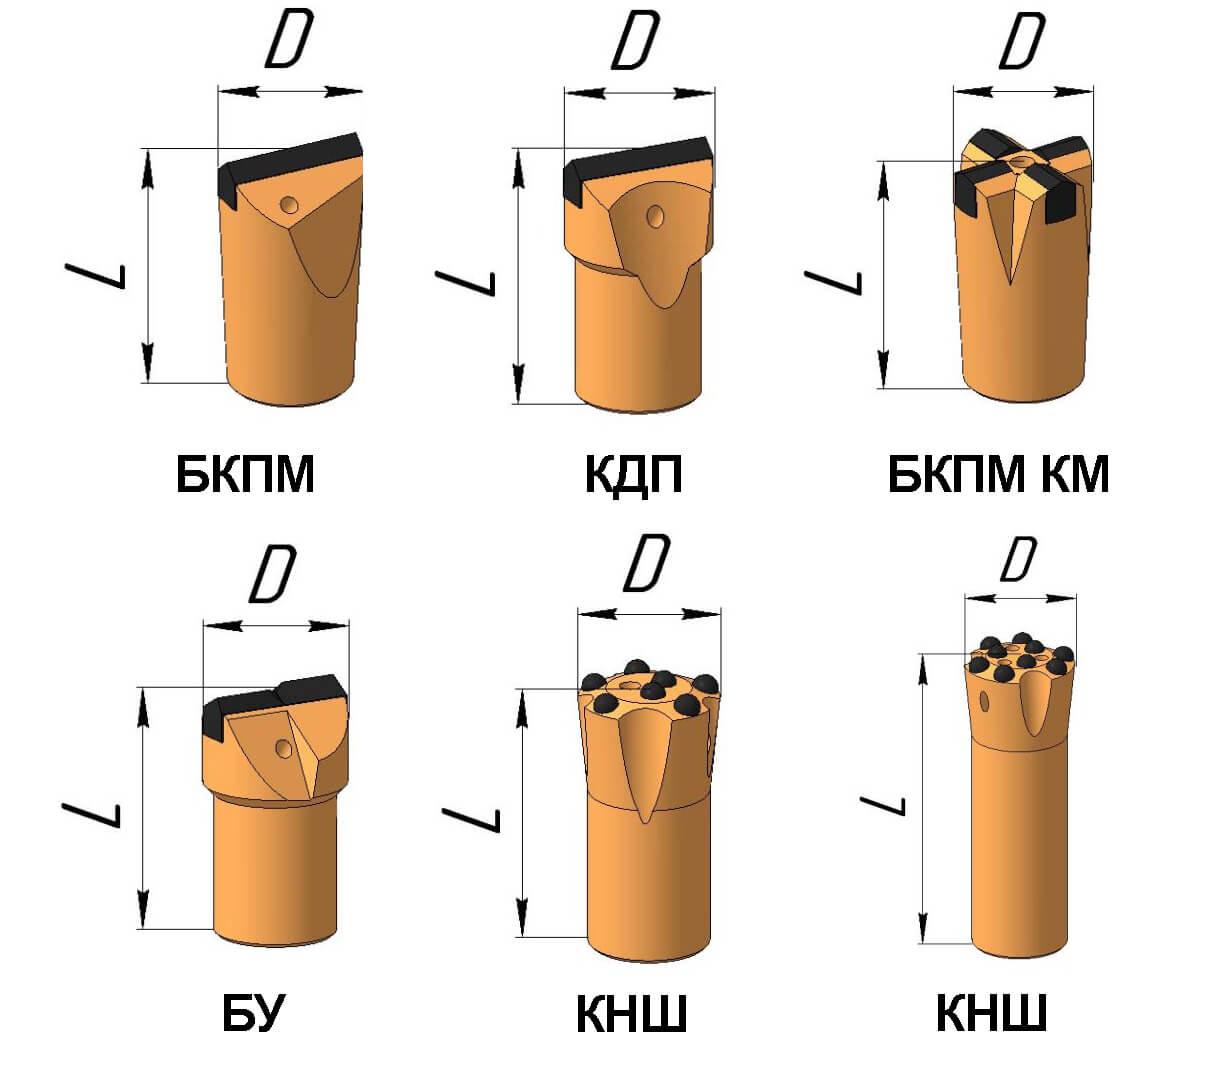 Буровая коронка БКПМ, КДП, БКПМ КМ, КНШ, БУ-43